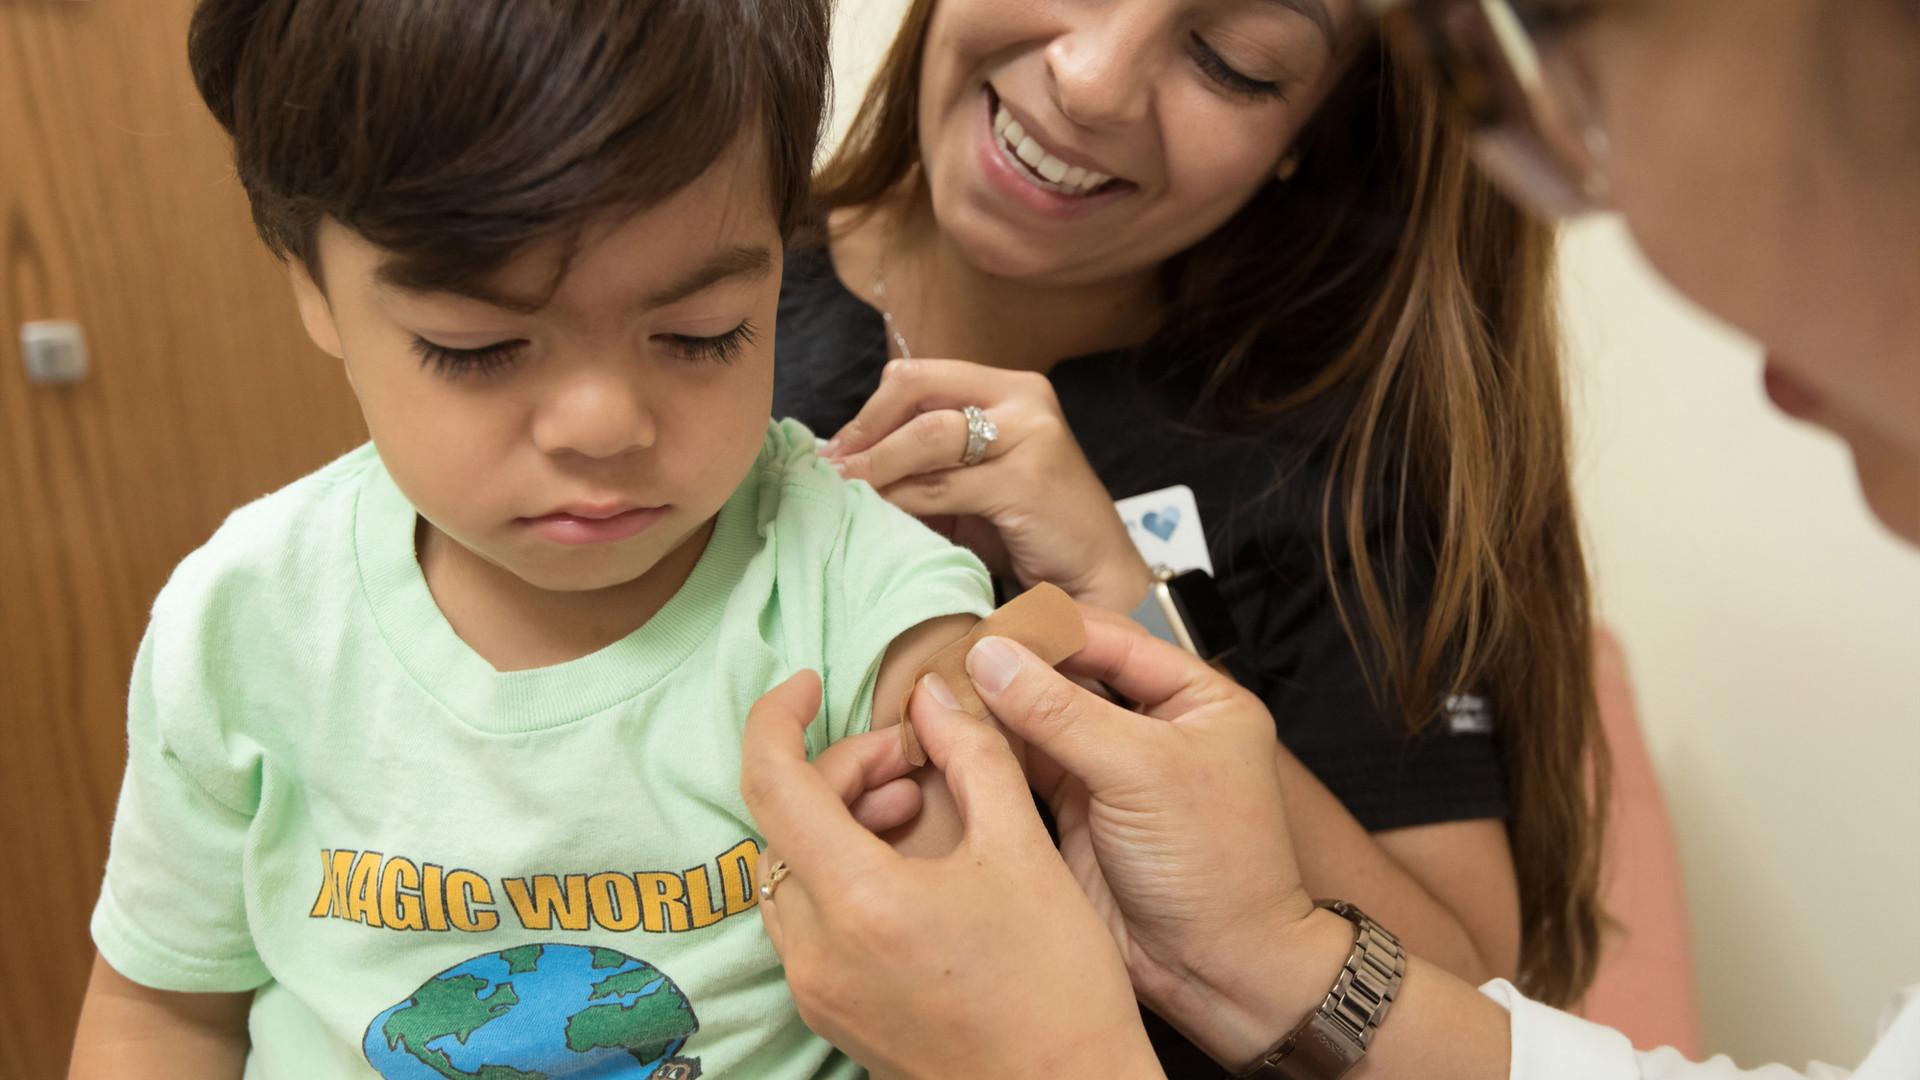 Primary Care for Children